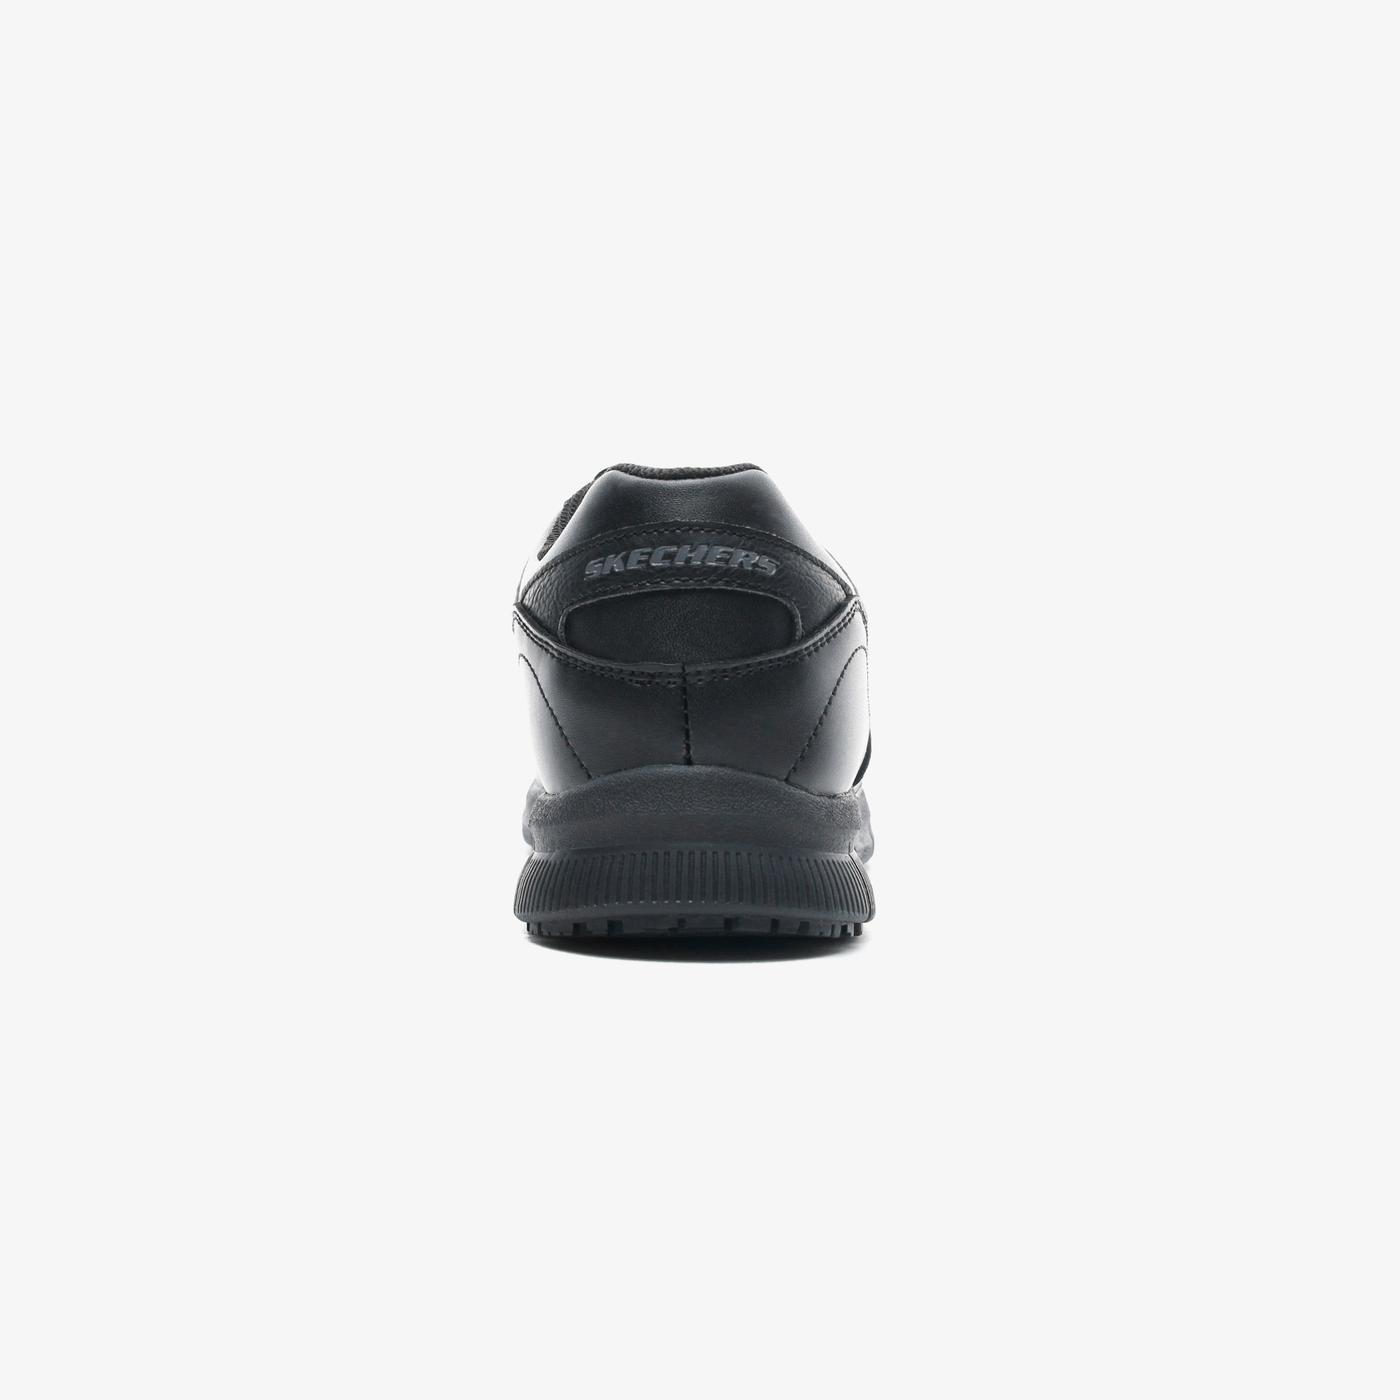 Skechers Work Relaxed Fit Nampa SR Erkek Siyah Spor Ayakkabı